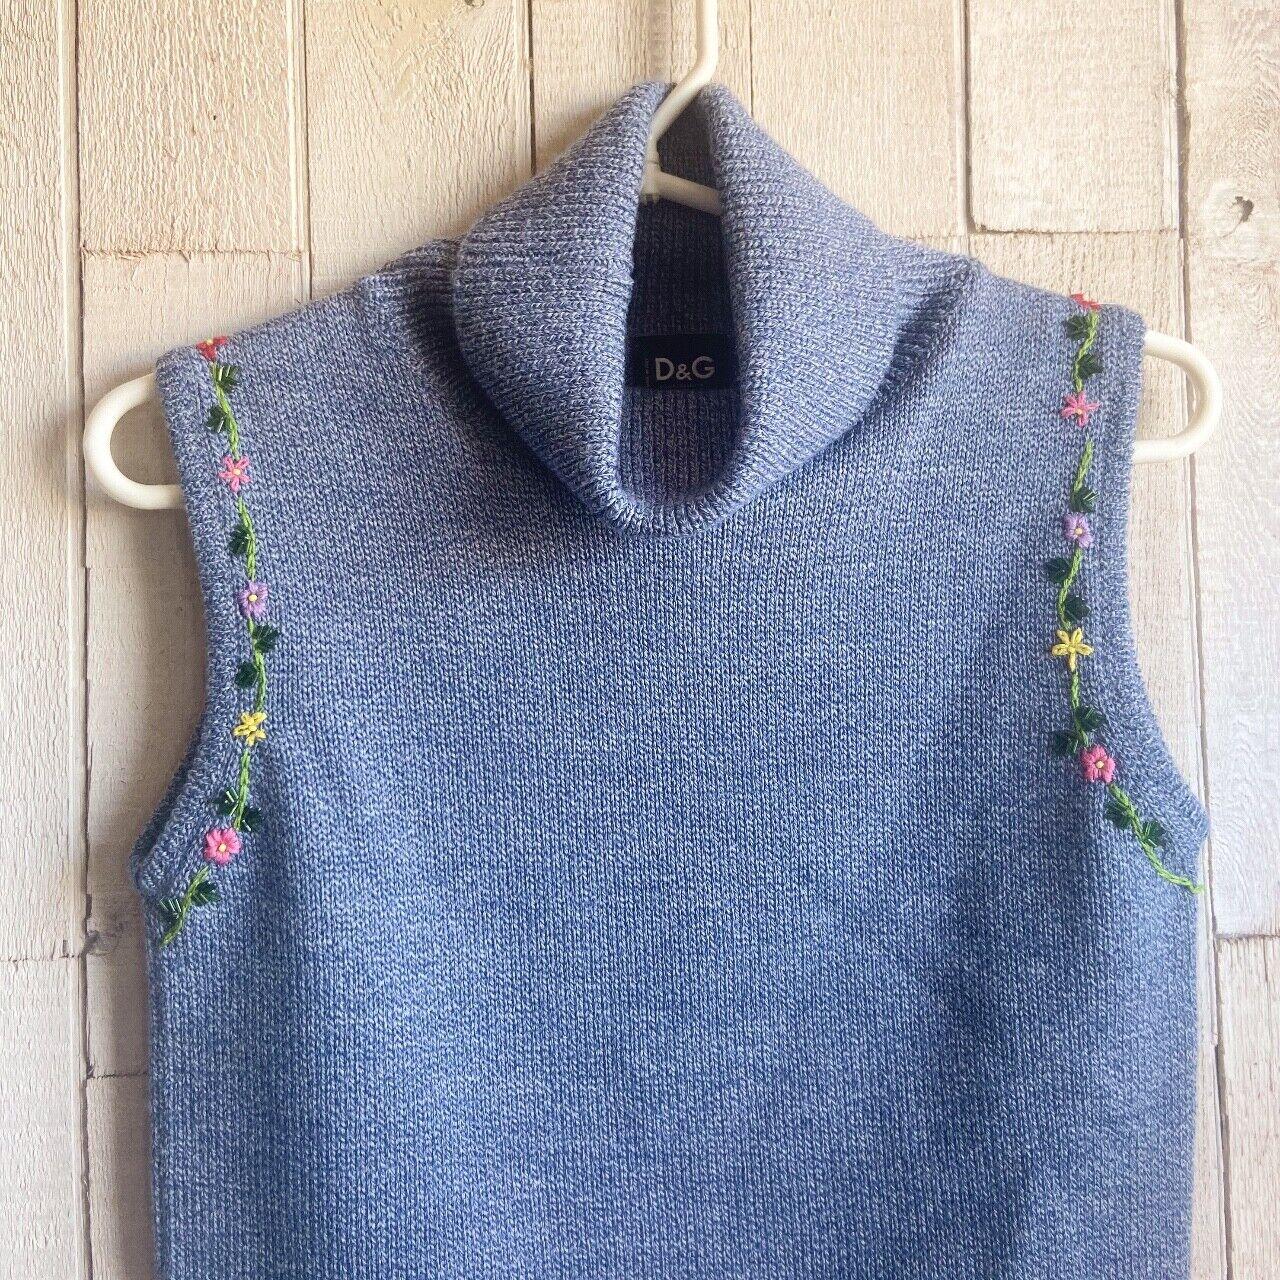 Dolce & Gabbana Knit Turtleneck Tank Top  - image 2